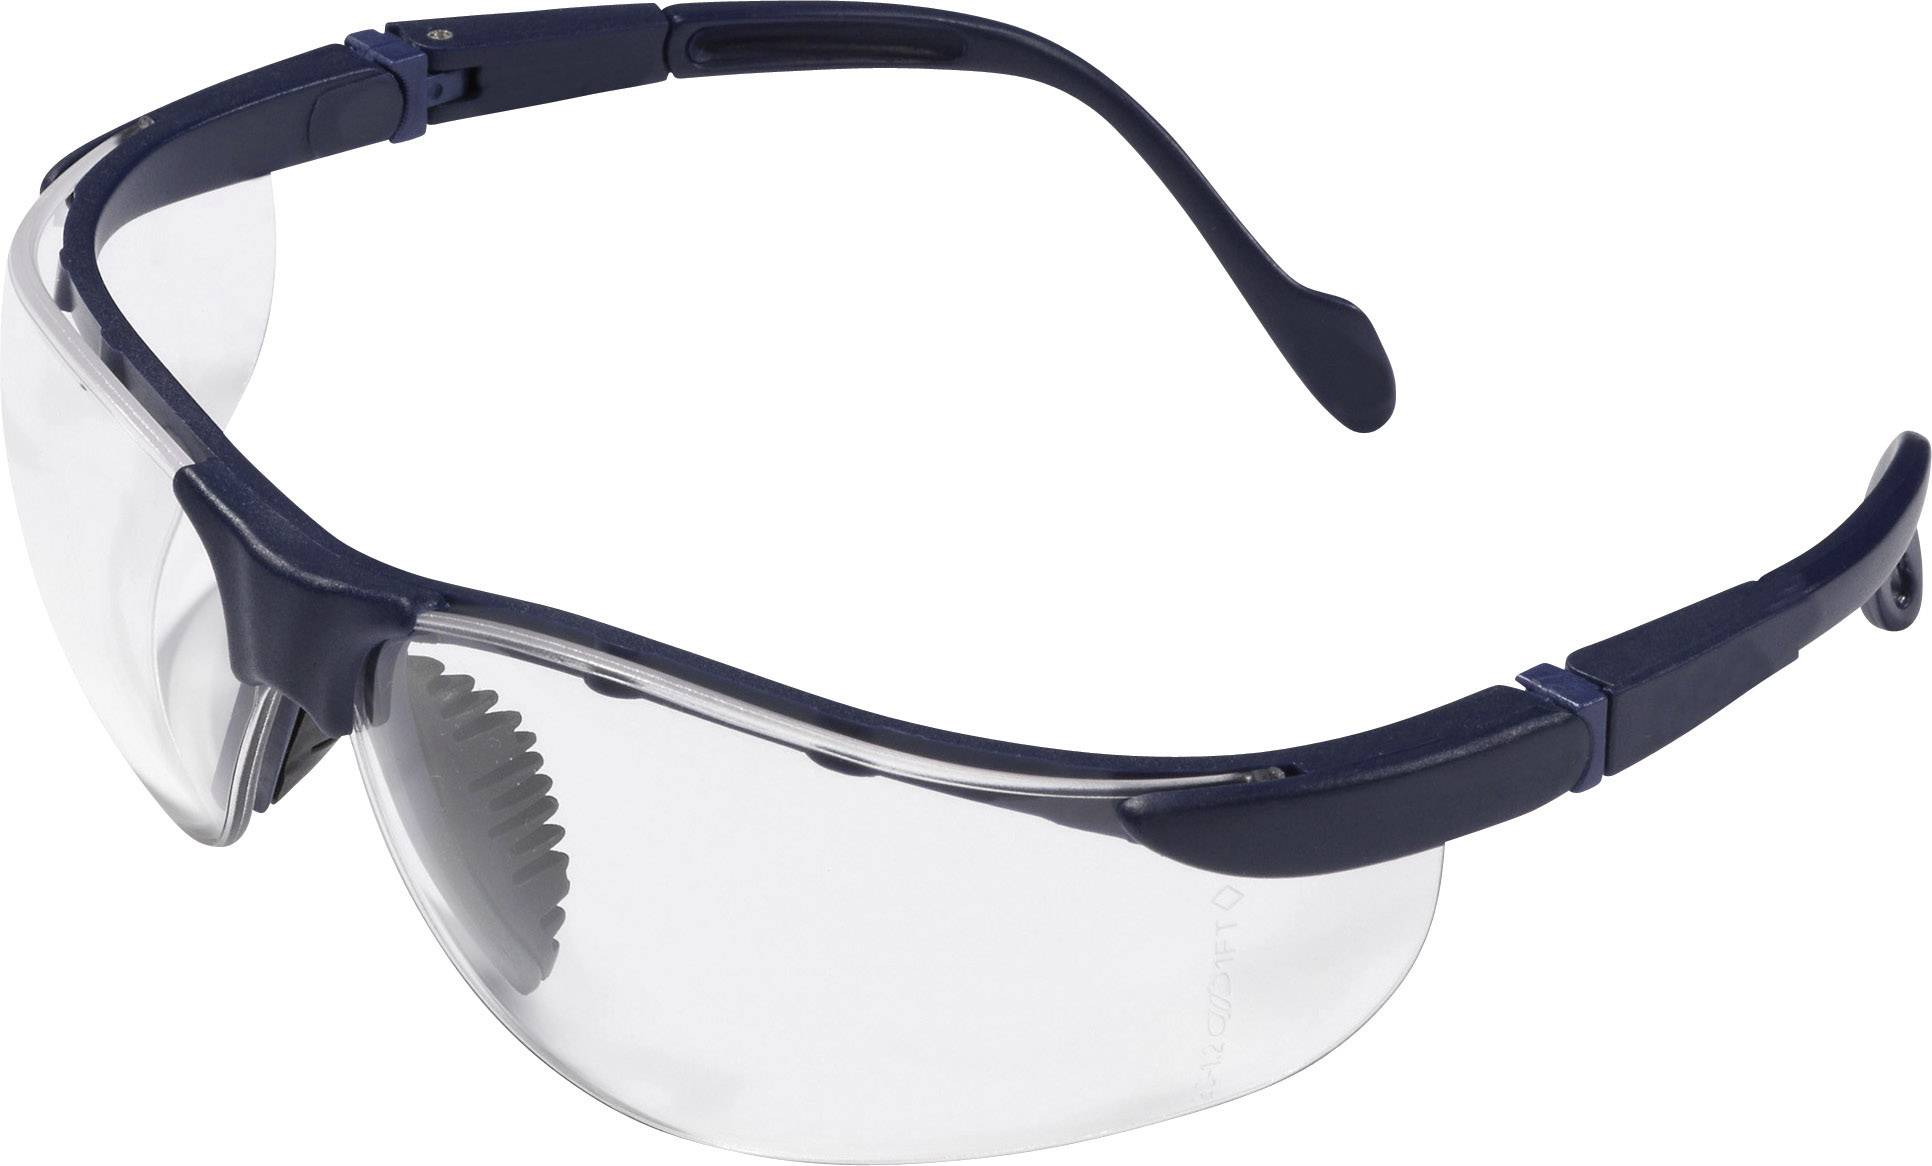 Ochranné okuliare protectionworld 2012003